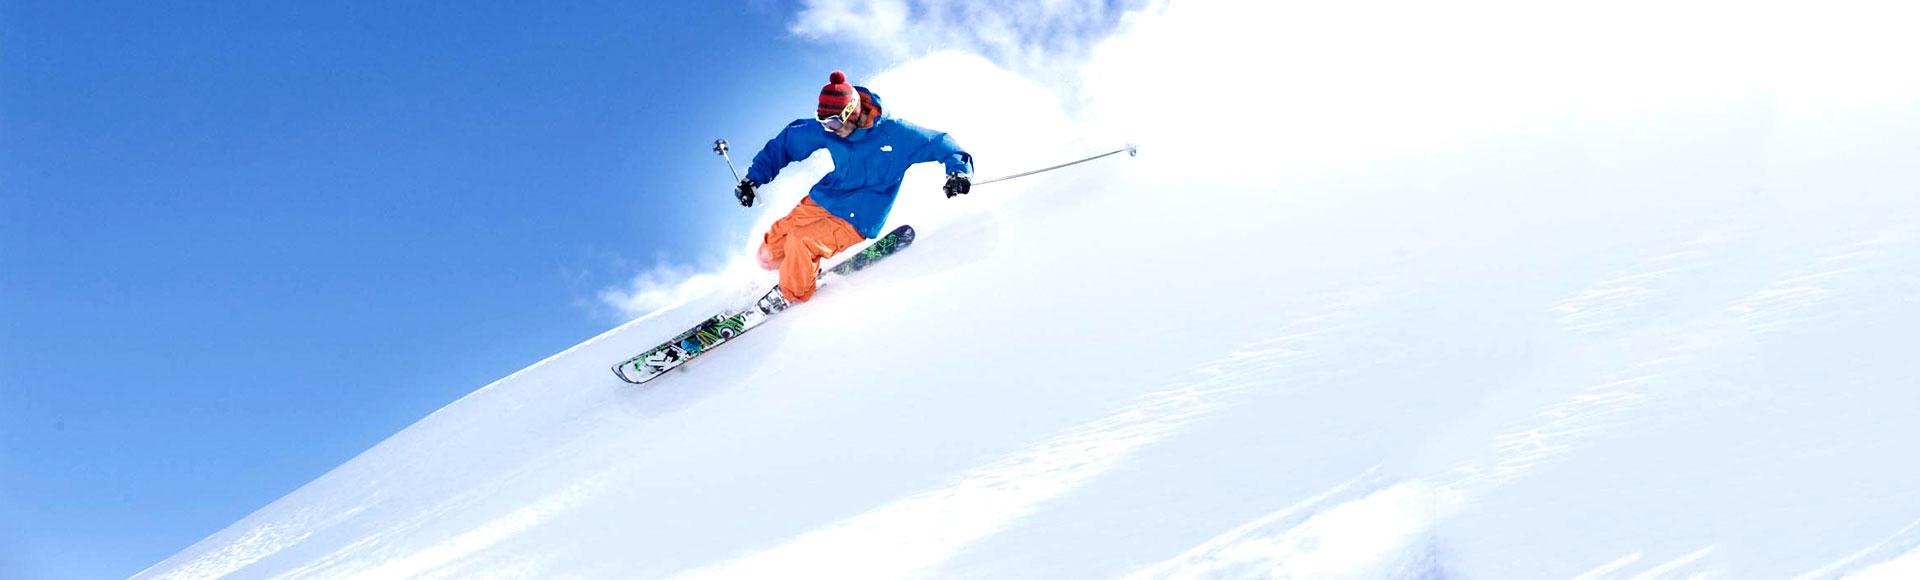 ofertas-ski-sul-home